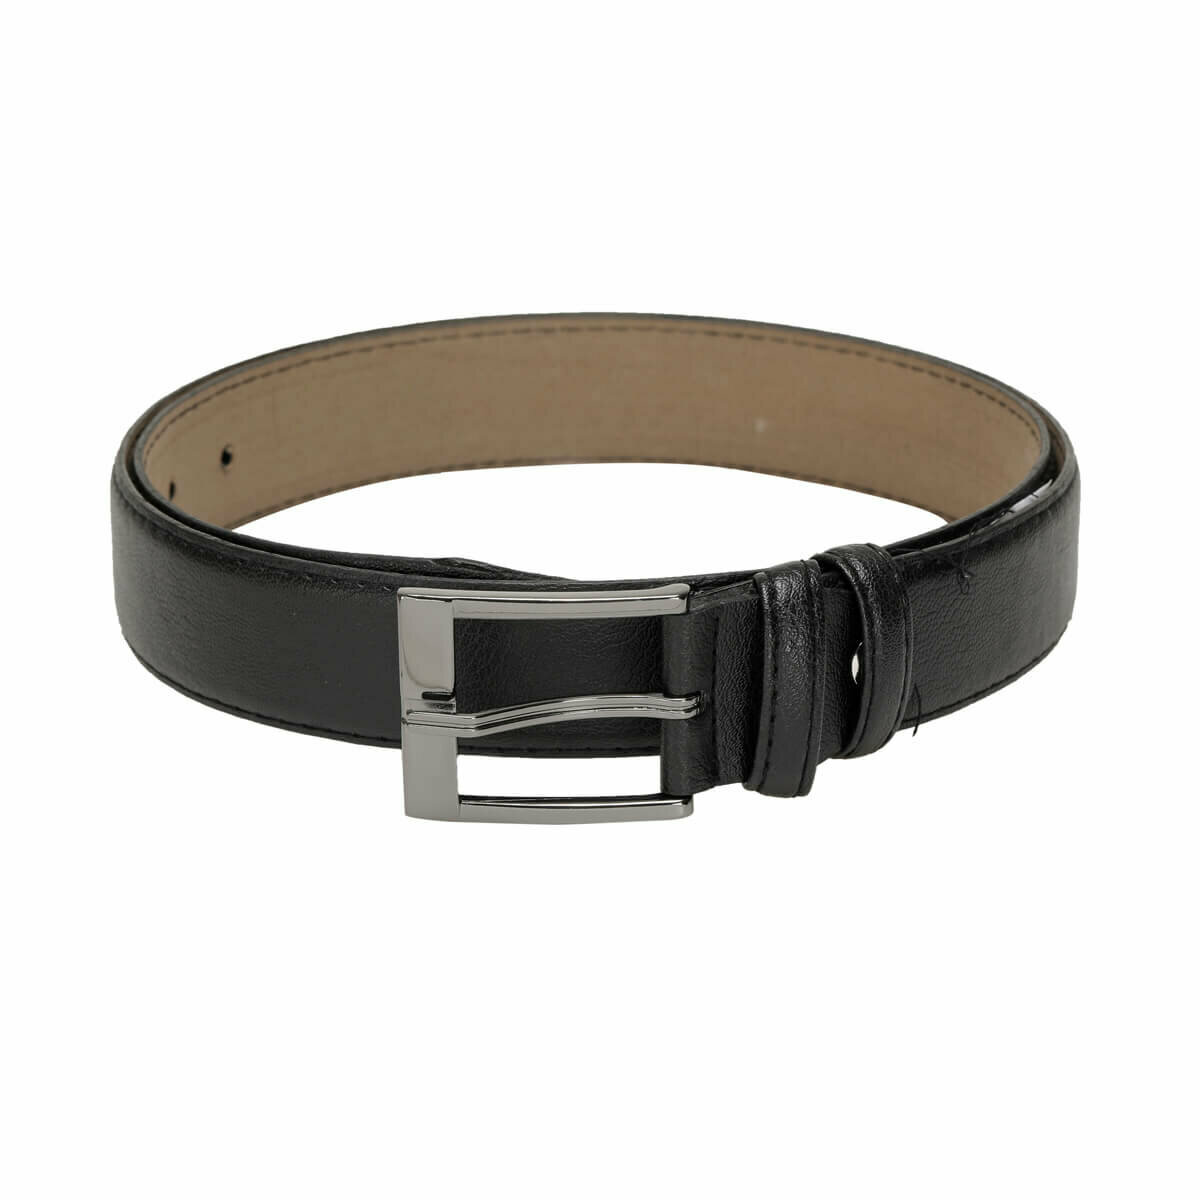 FLO MGVN3507 Black Male Belt Garamond